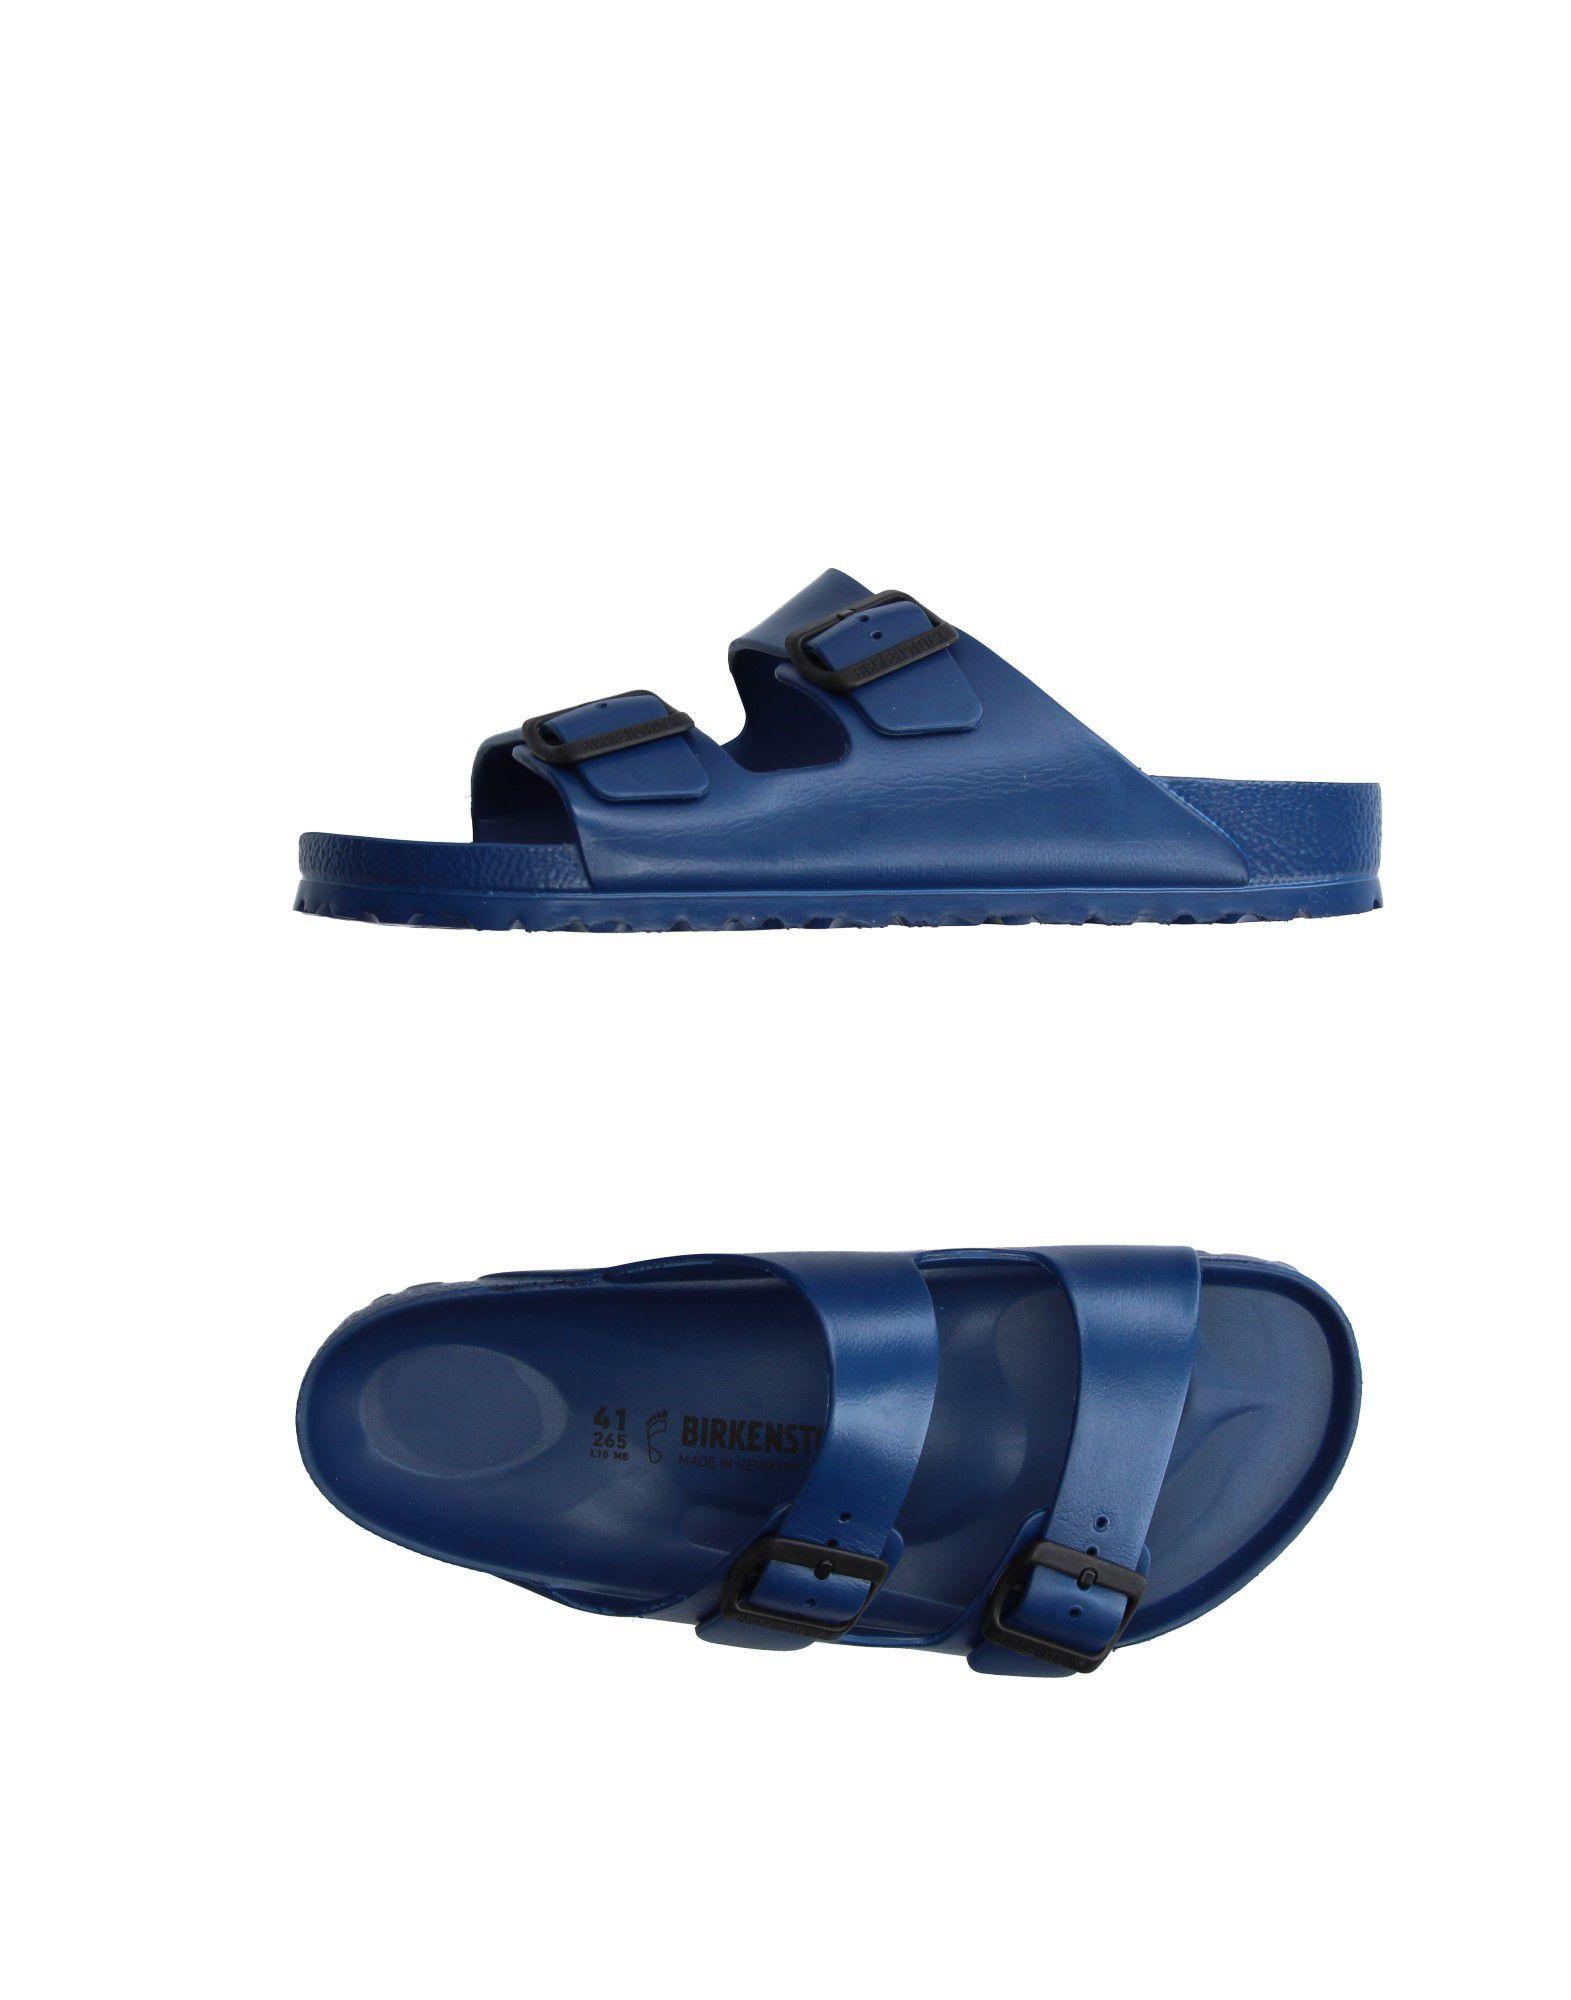 Birkenstock Sandals - Men Birkenstock Sandals online on on on  Australia - 11217738OJ d35984